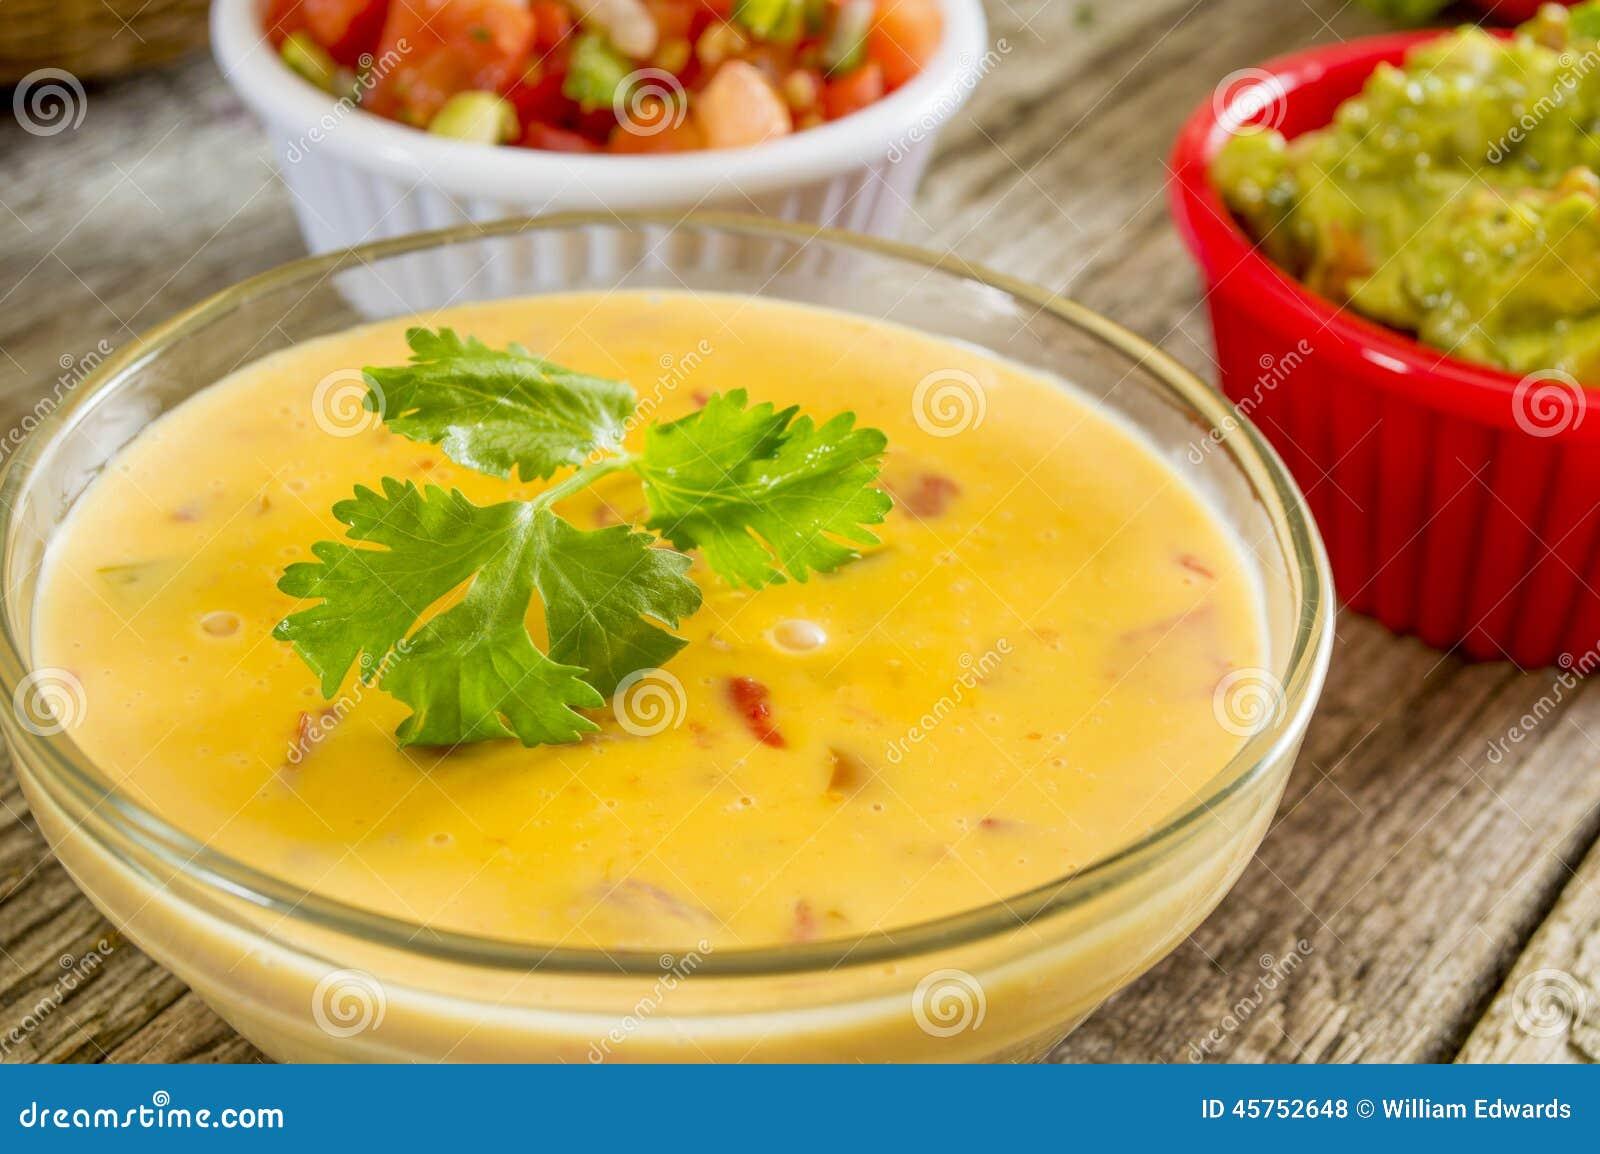 Spisy cheese dip